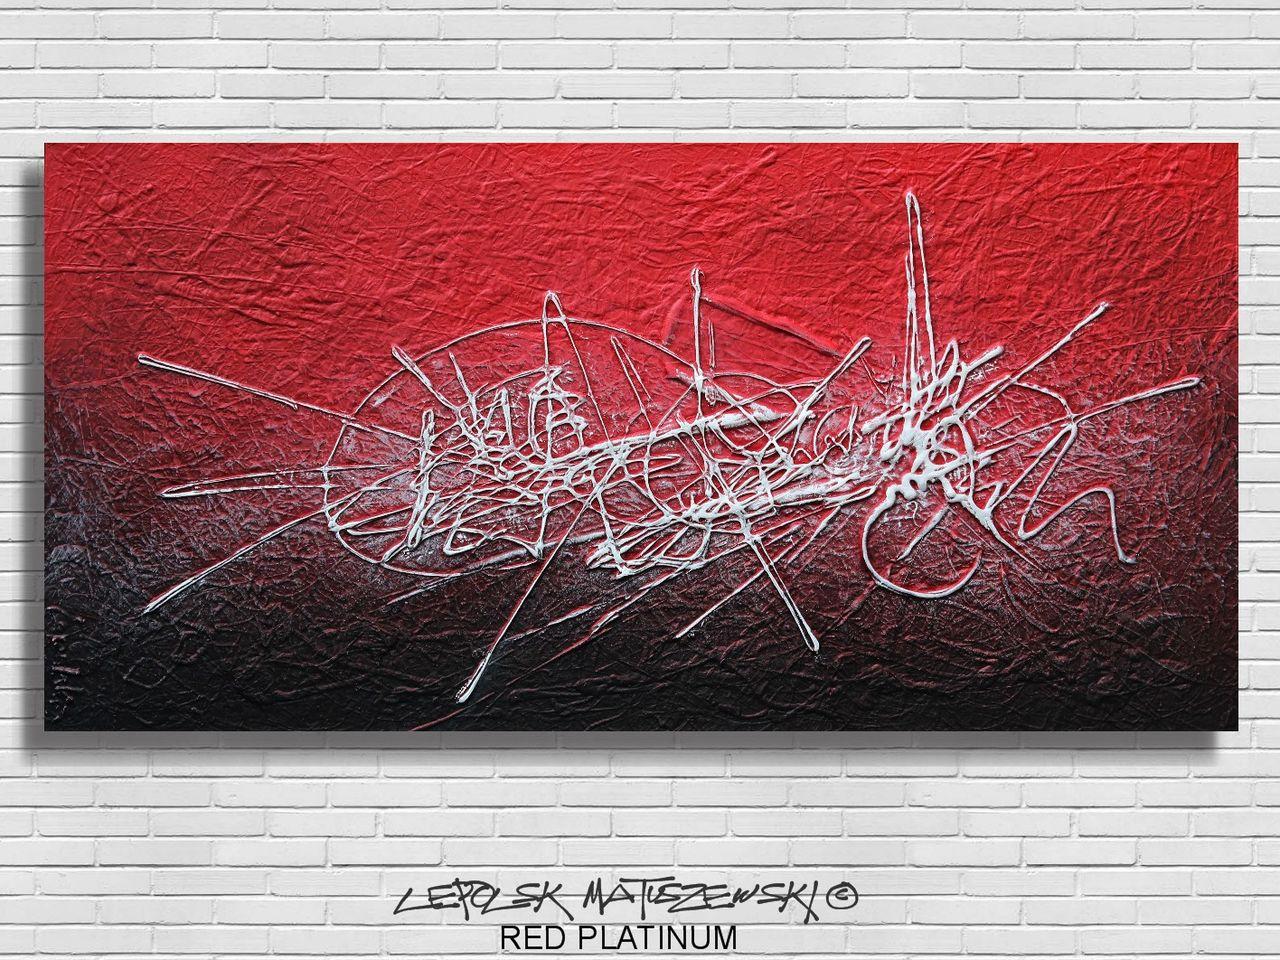 LEPOLSK MATUSZEWSKI RED PLATINUM   lepolsk Matuszewski 2017